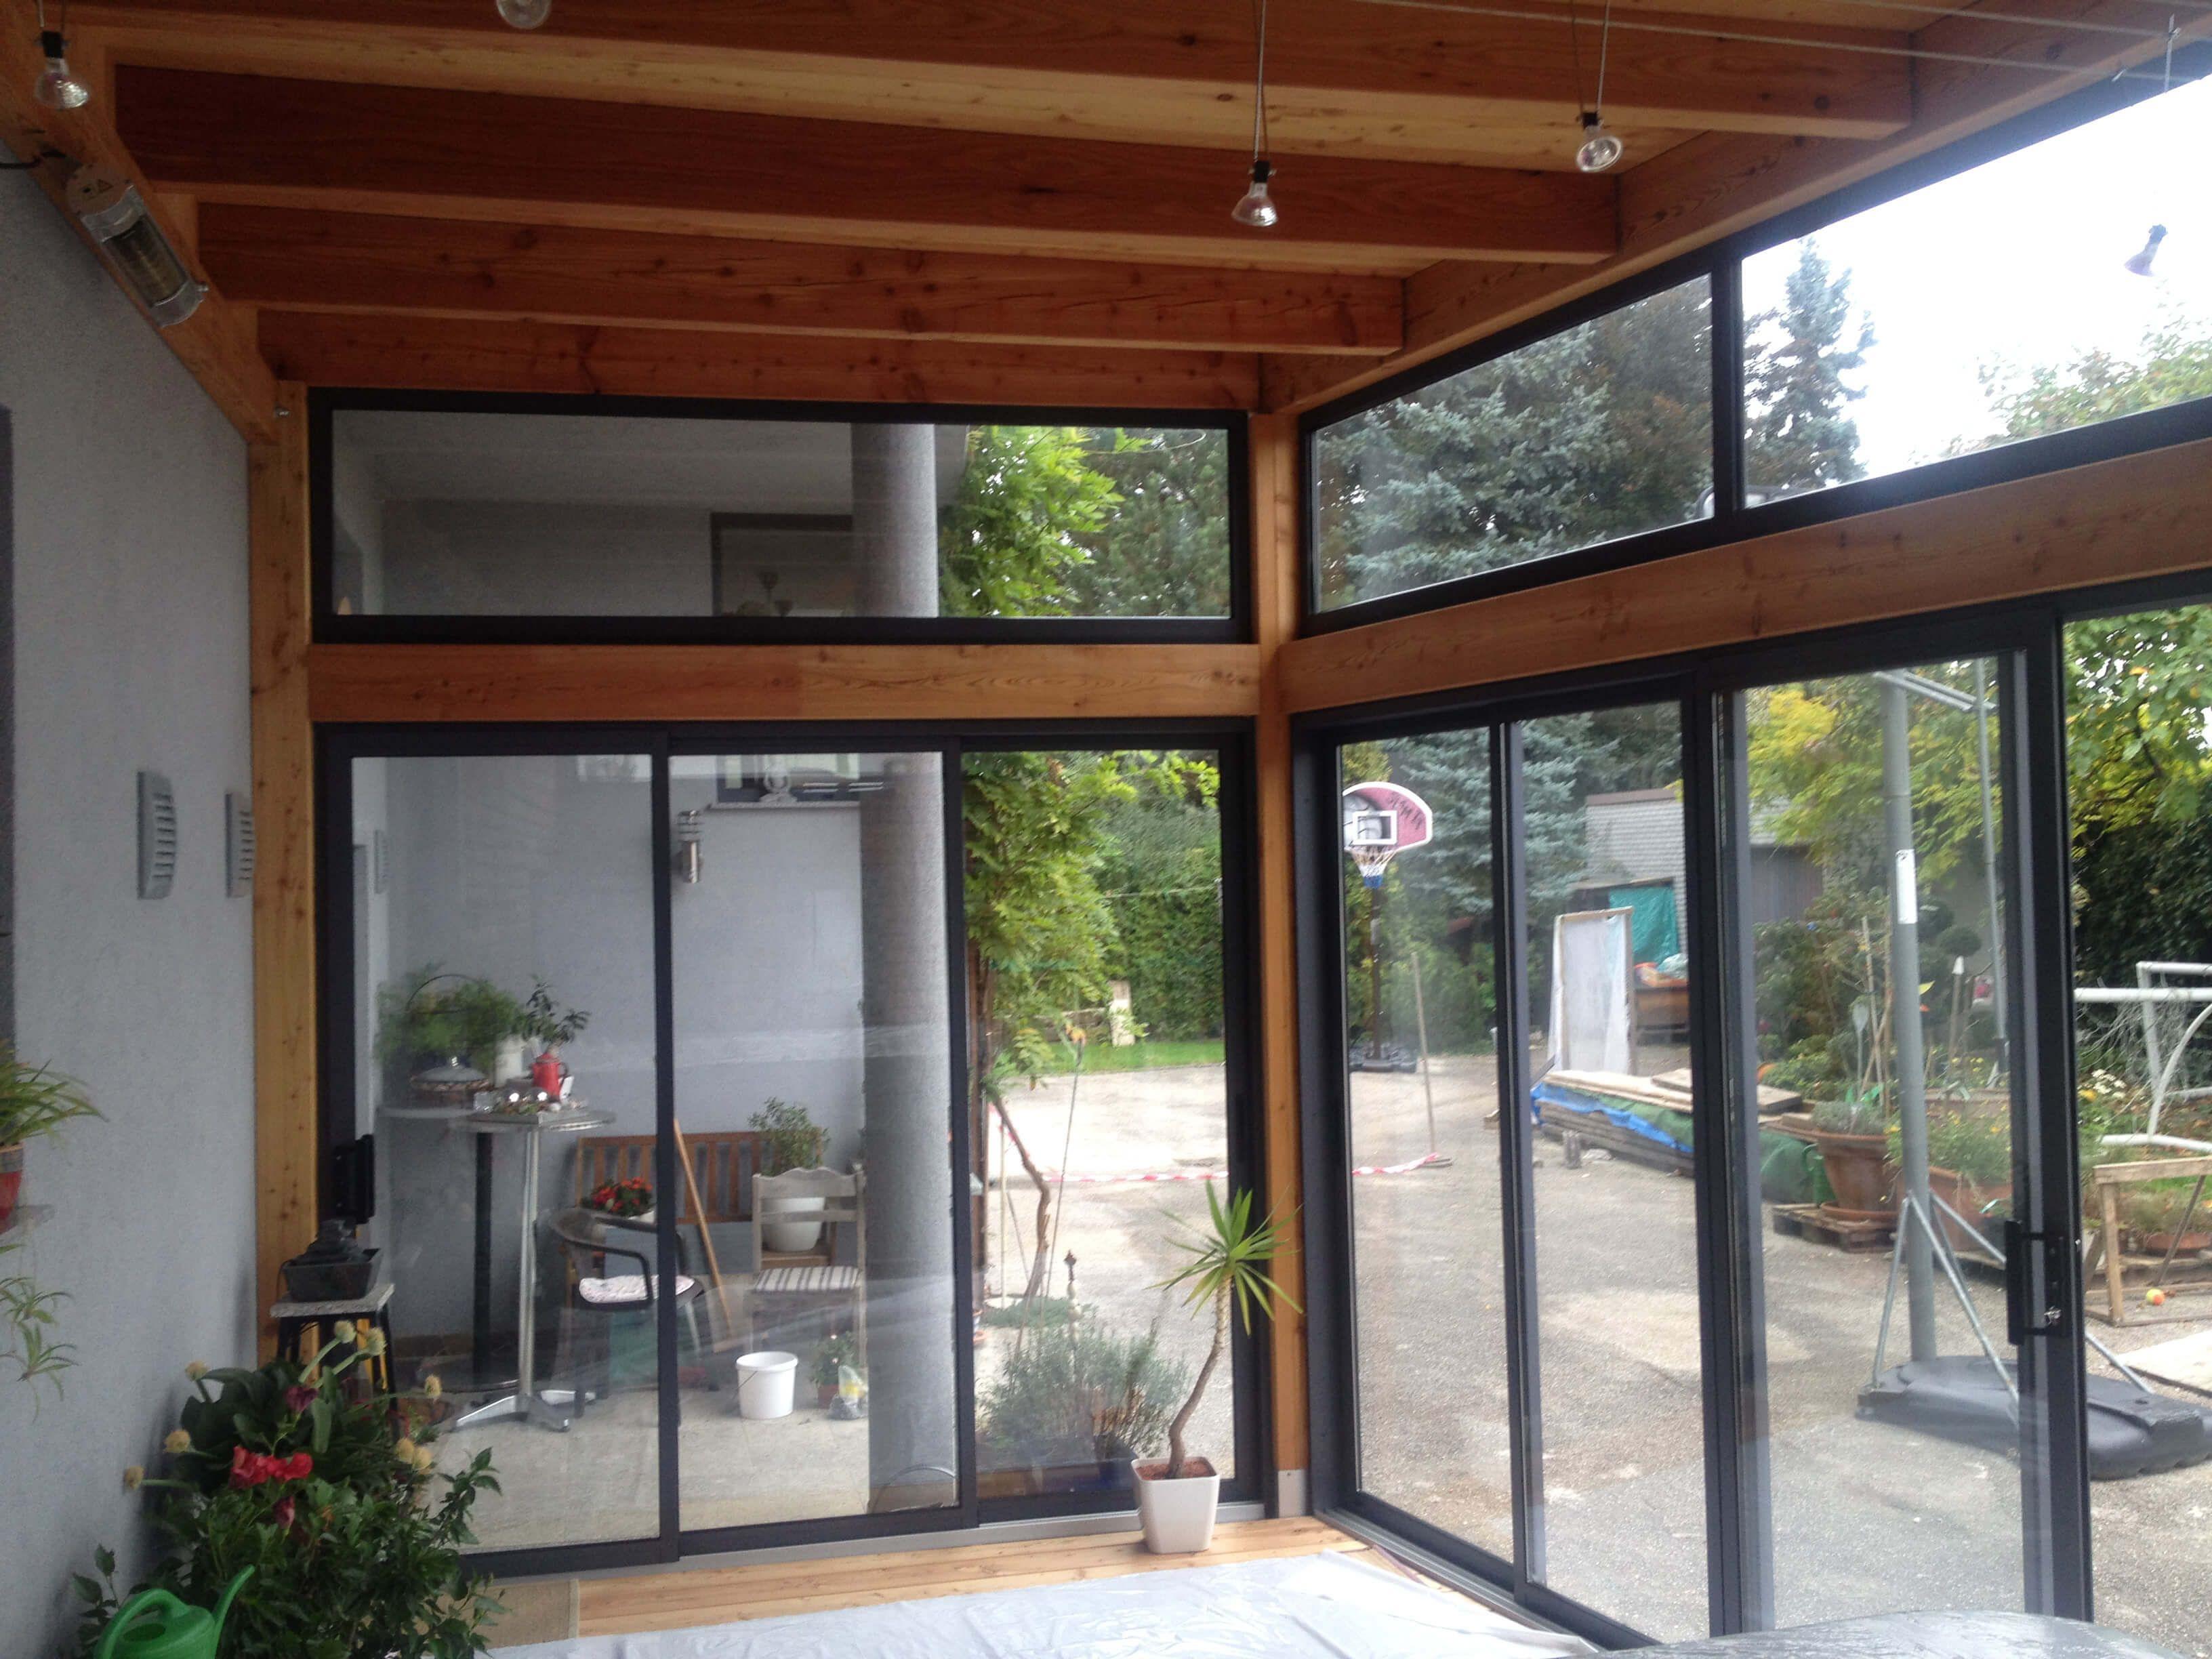 anbau mit schiebefenster in holzkonstruktion in 2019 balkonverglasung terrassenverglasung. Black Bedroom Furniture Sets. Home Design Ideas